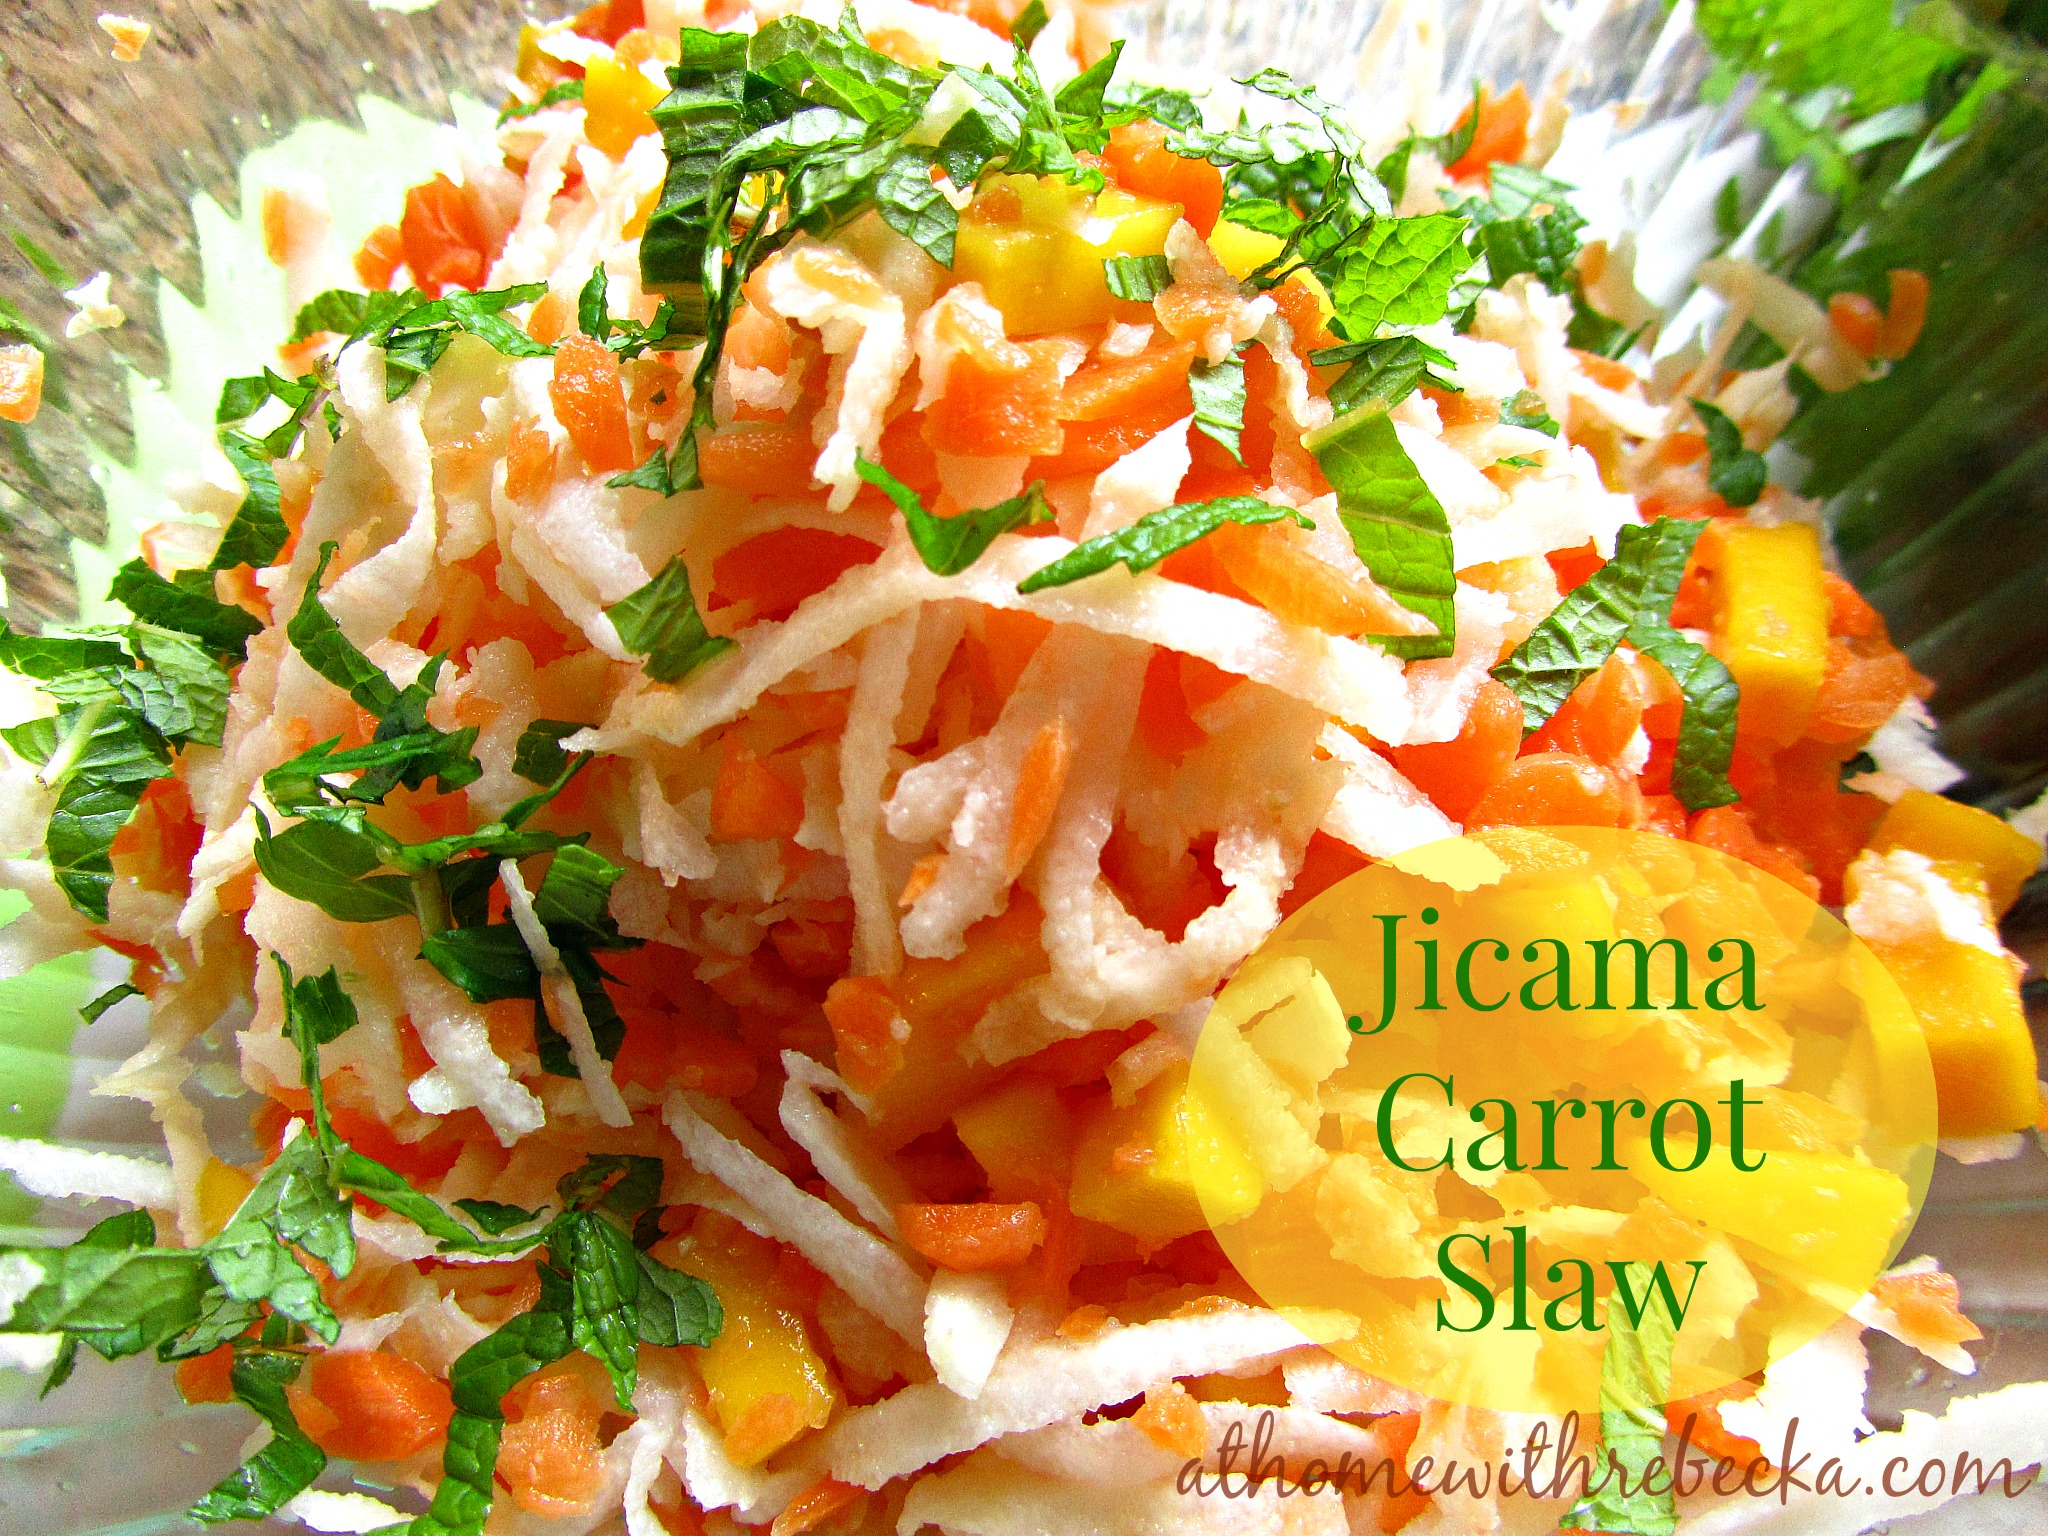 Jicama Carrot Slaw